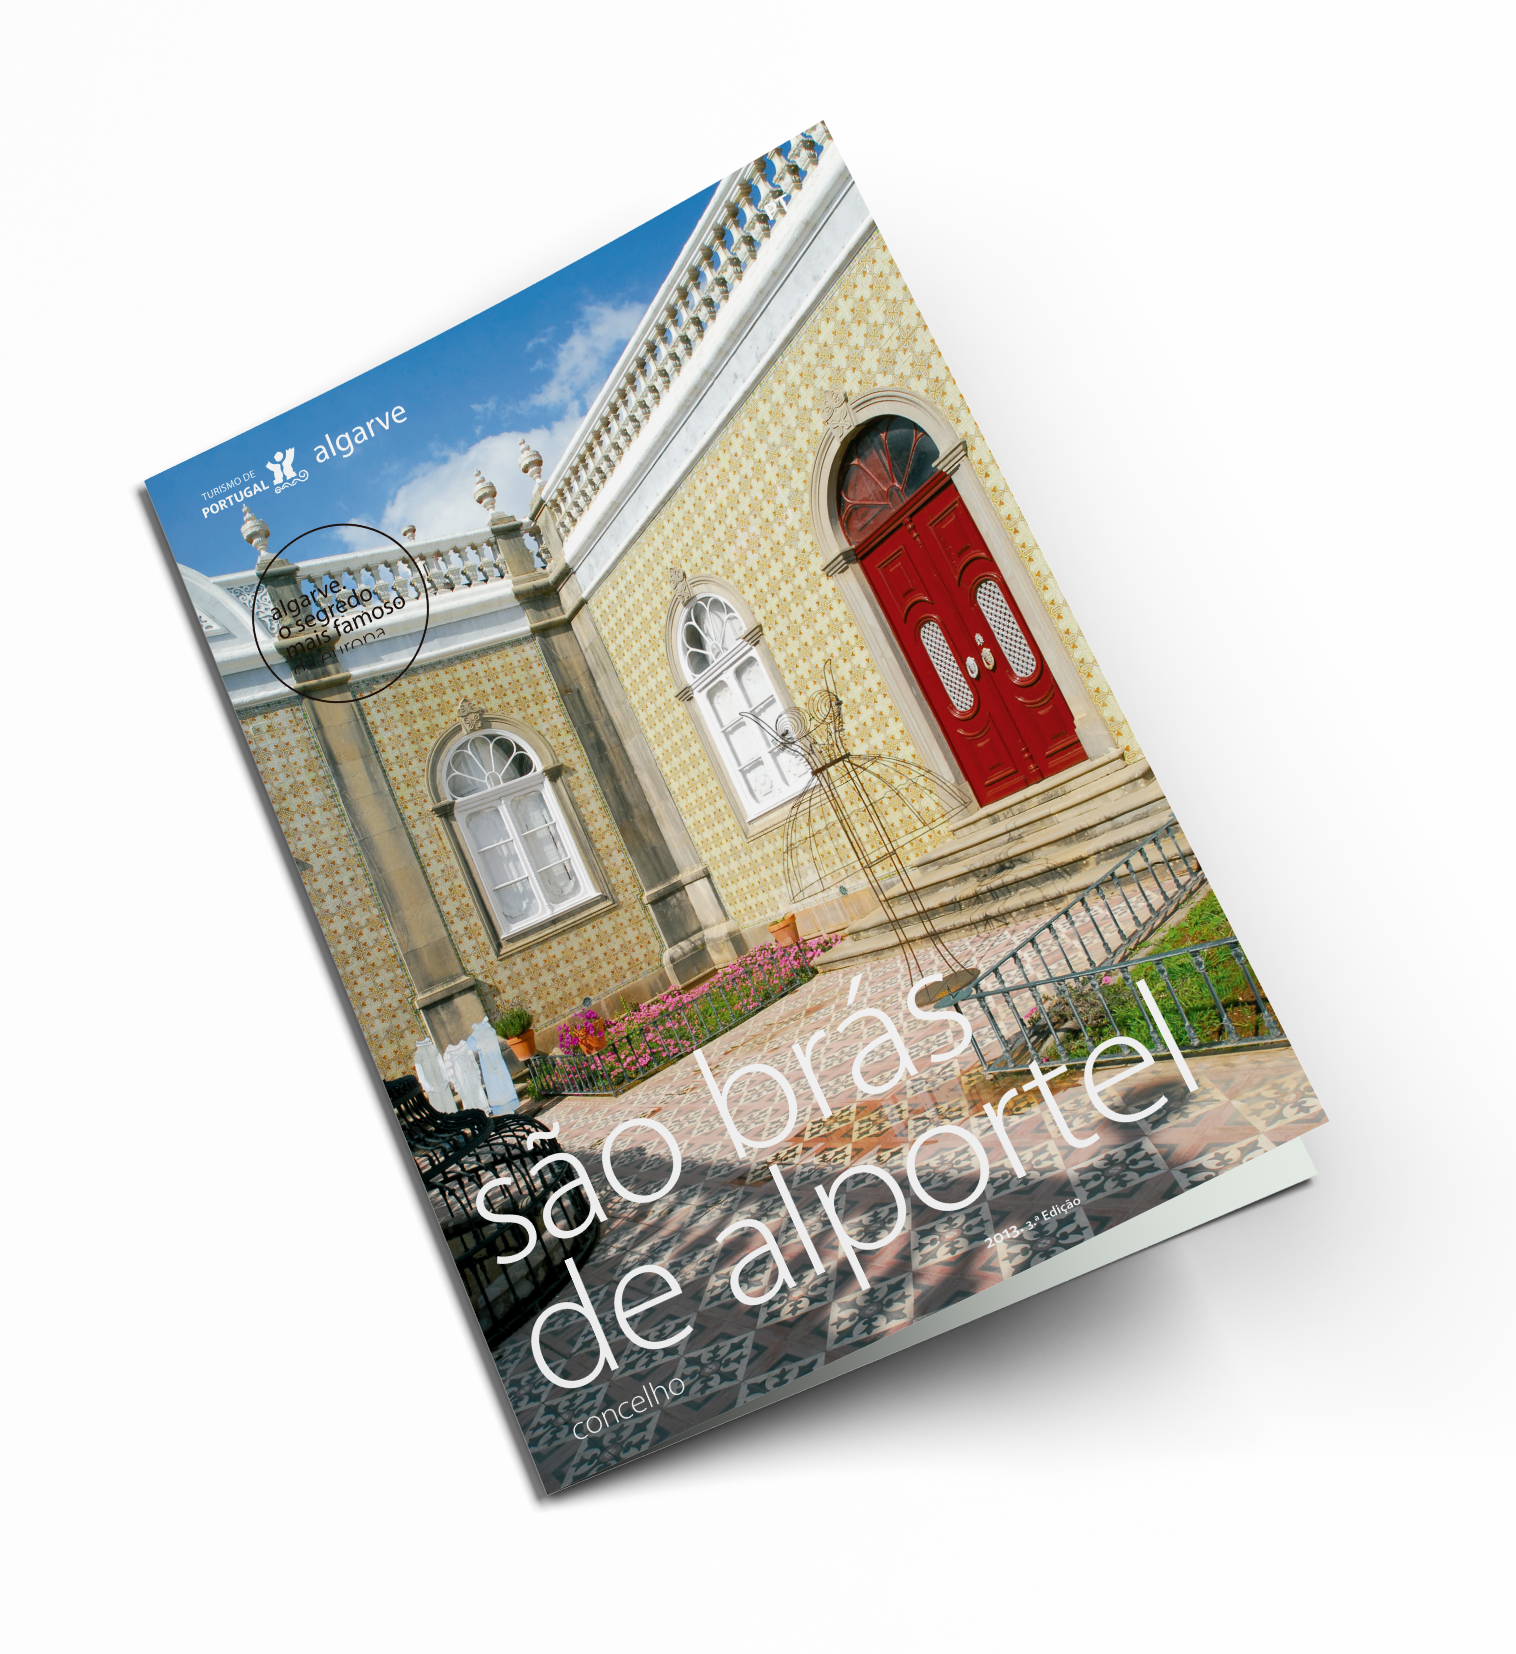 Broschüre über den Bezirk São Brás de Alportel